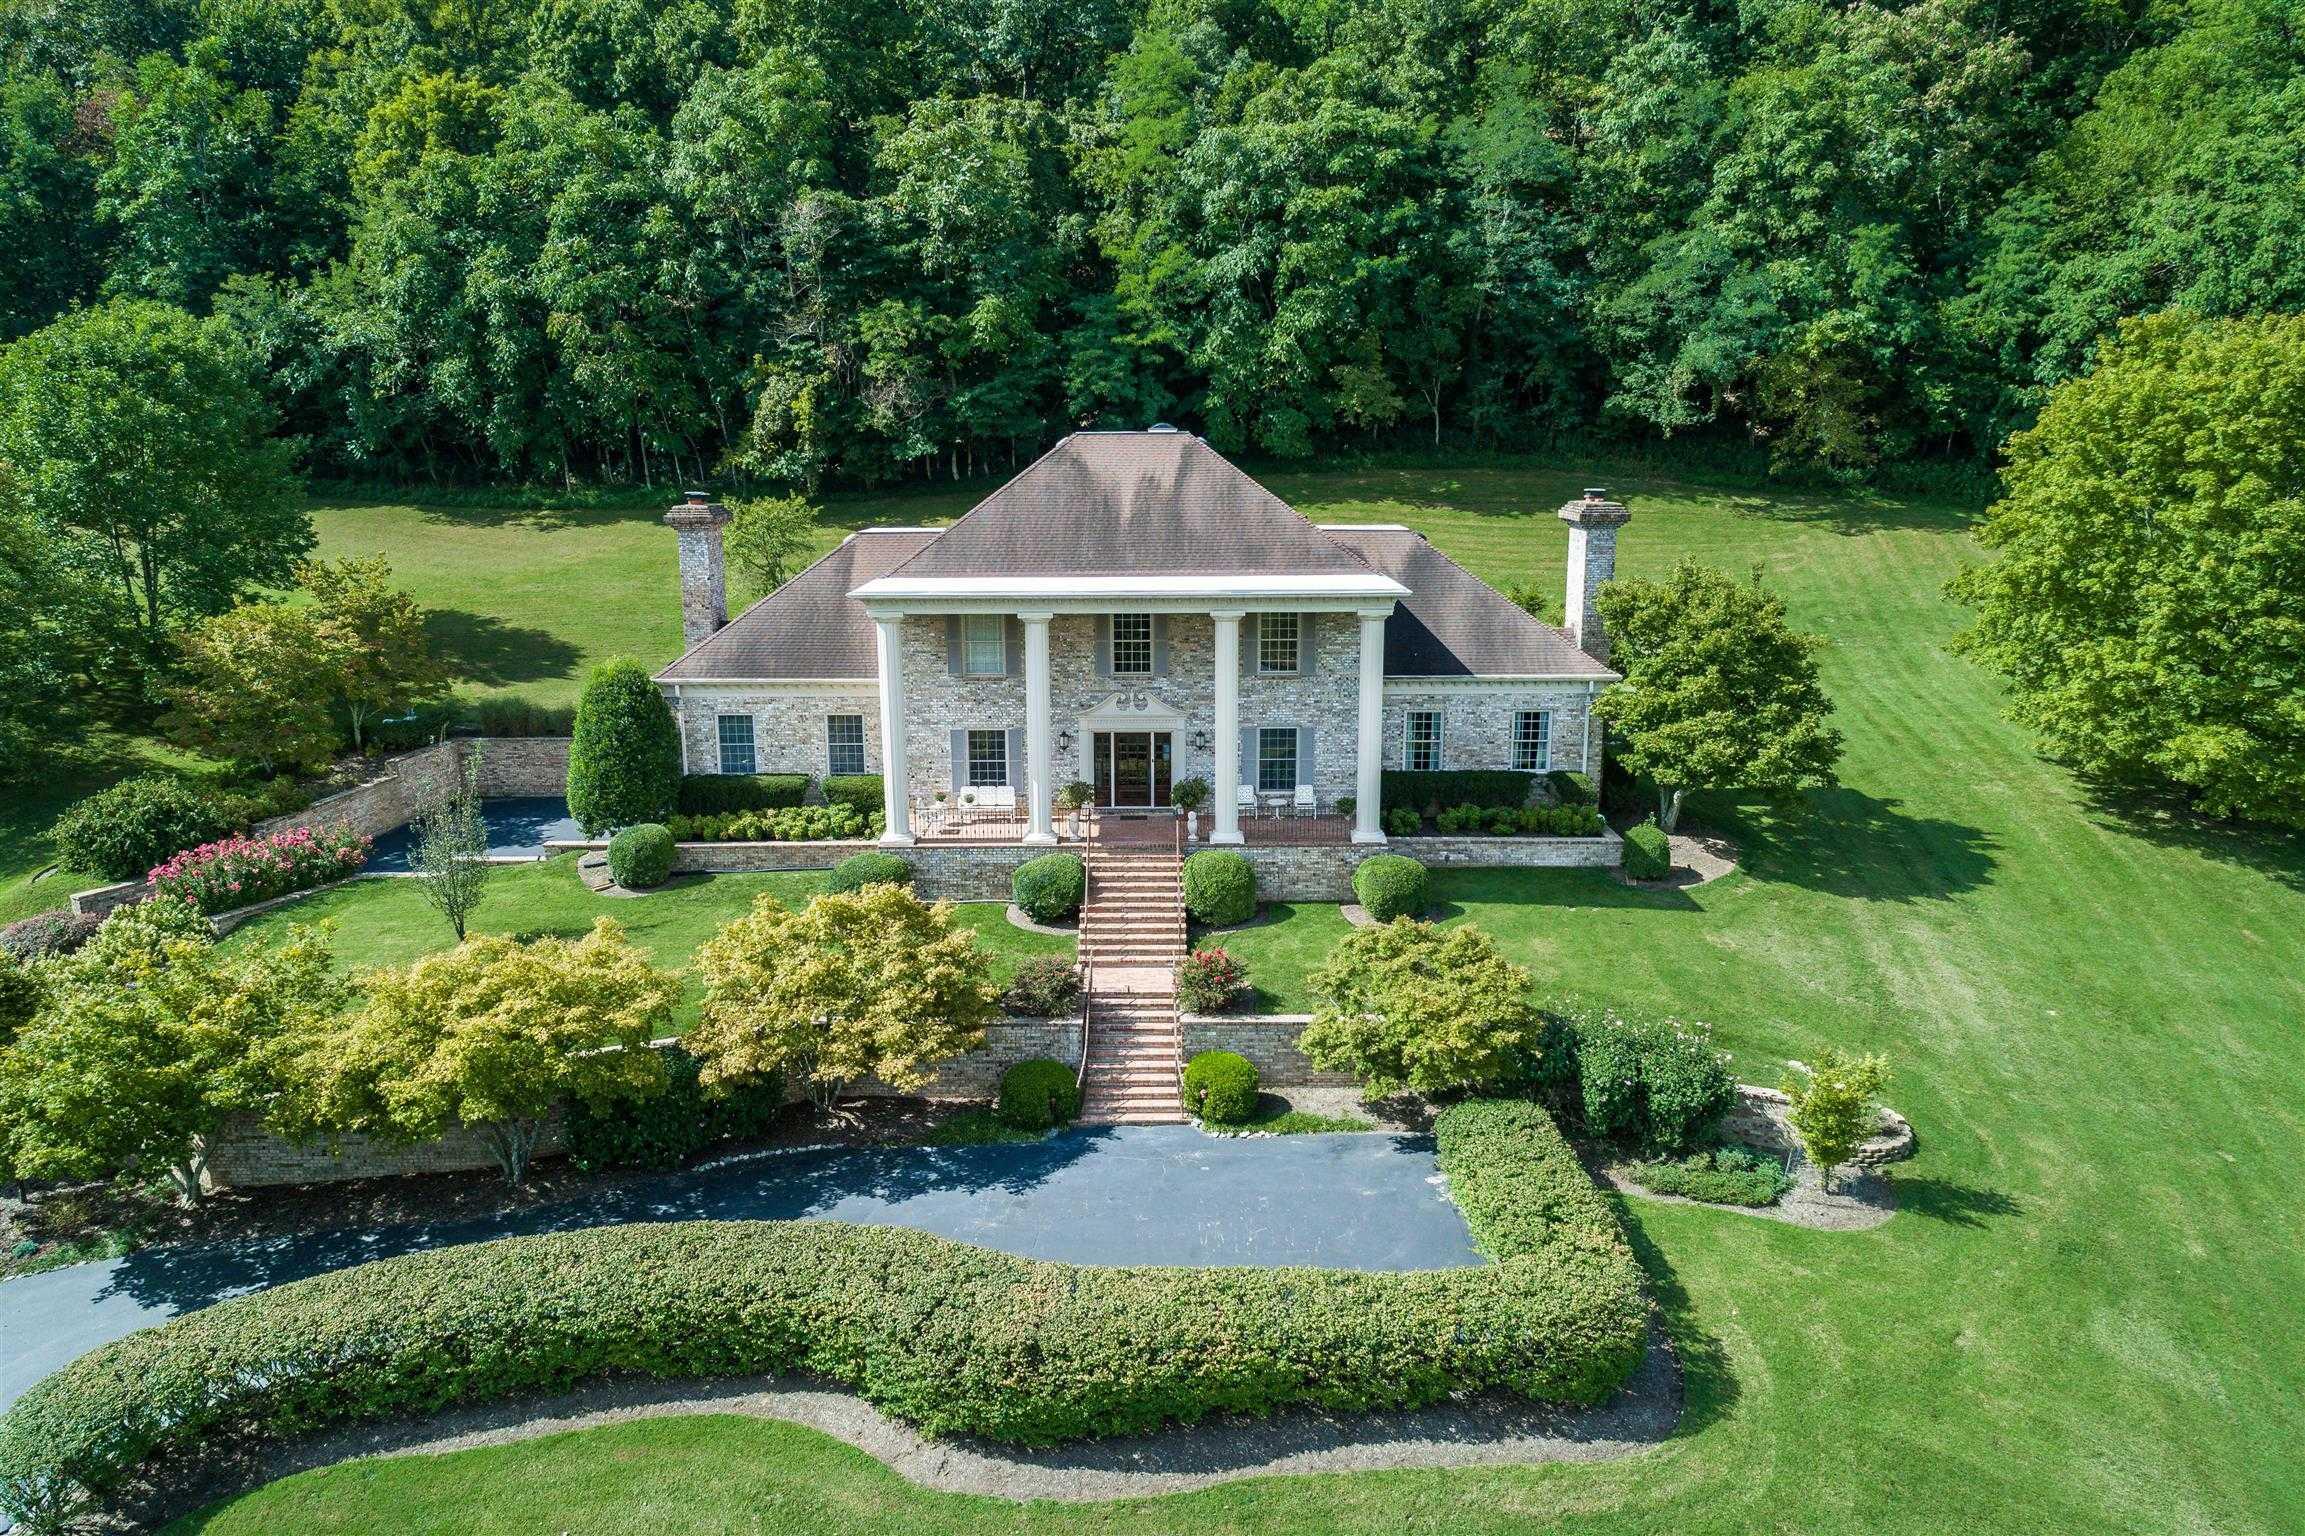 $6,850,000 - 4Br/4Ba -  for Sale in Hidden Valley Est, Brentwood